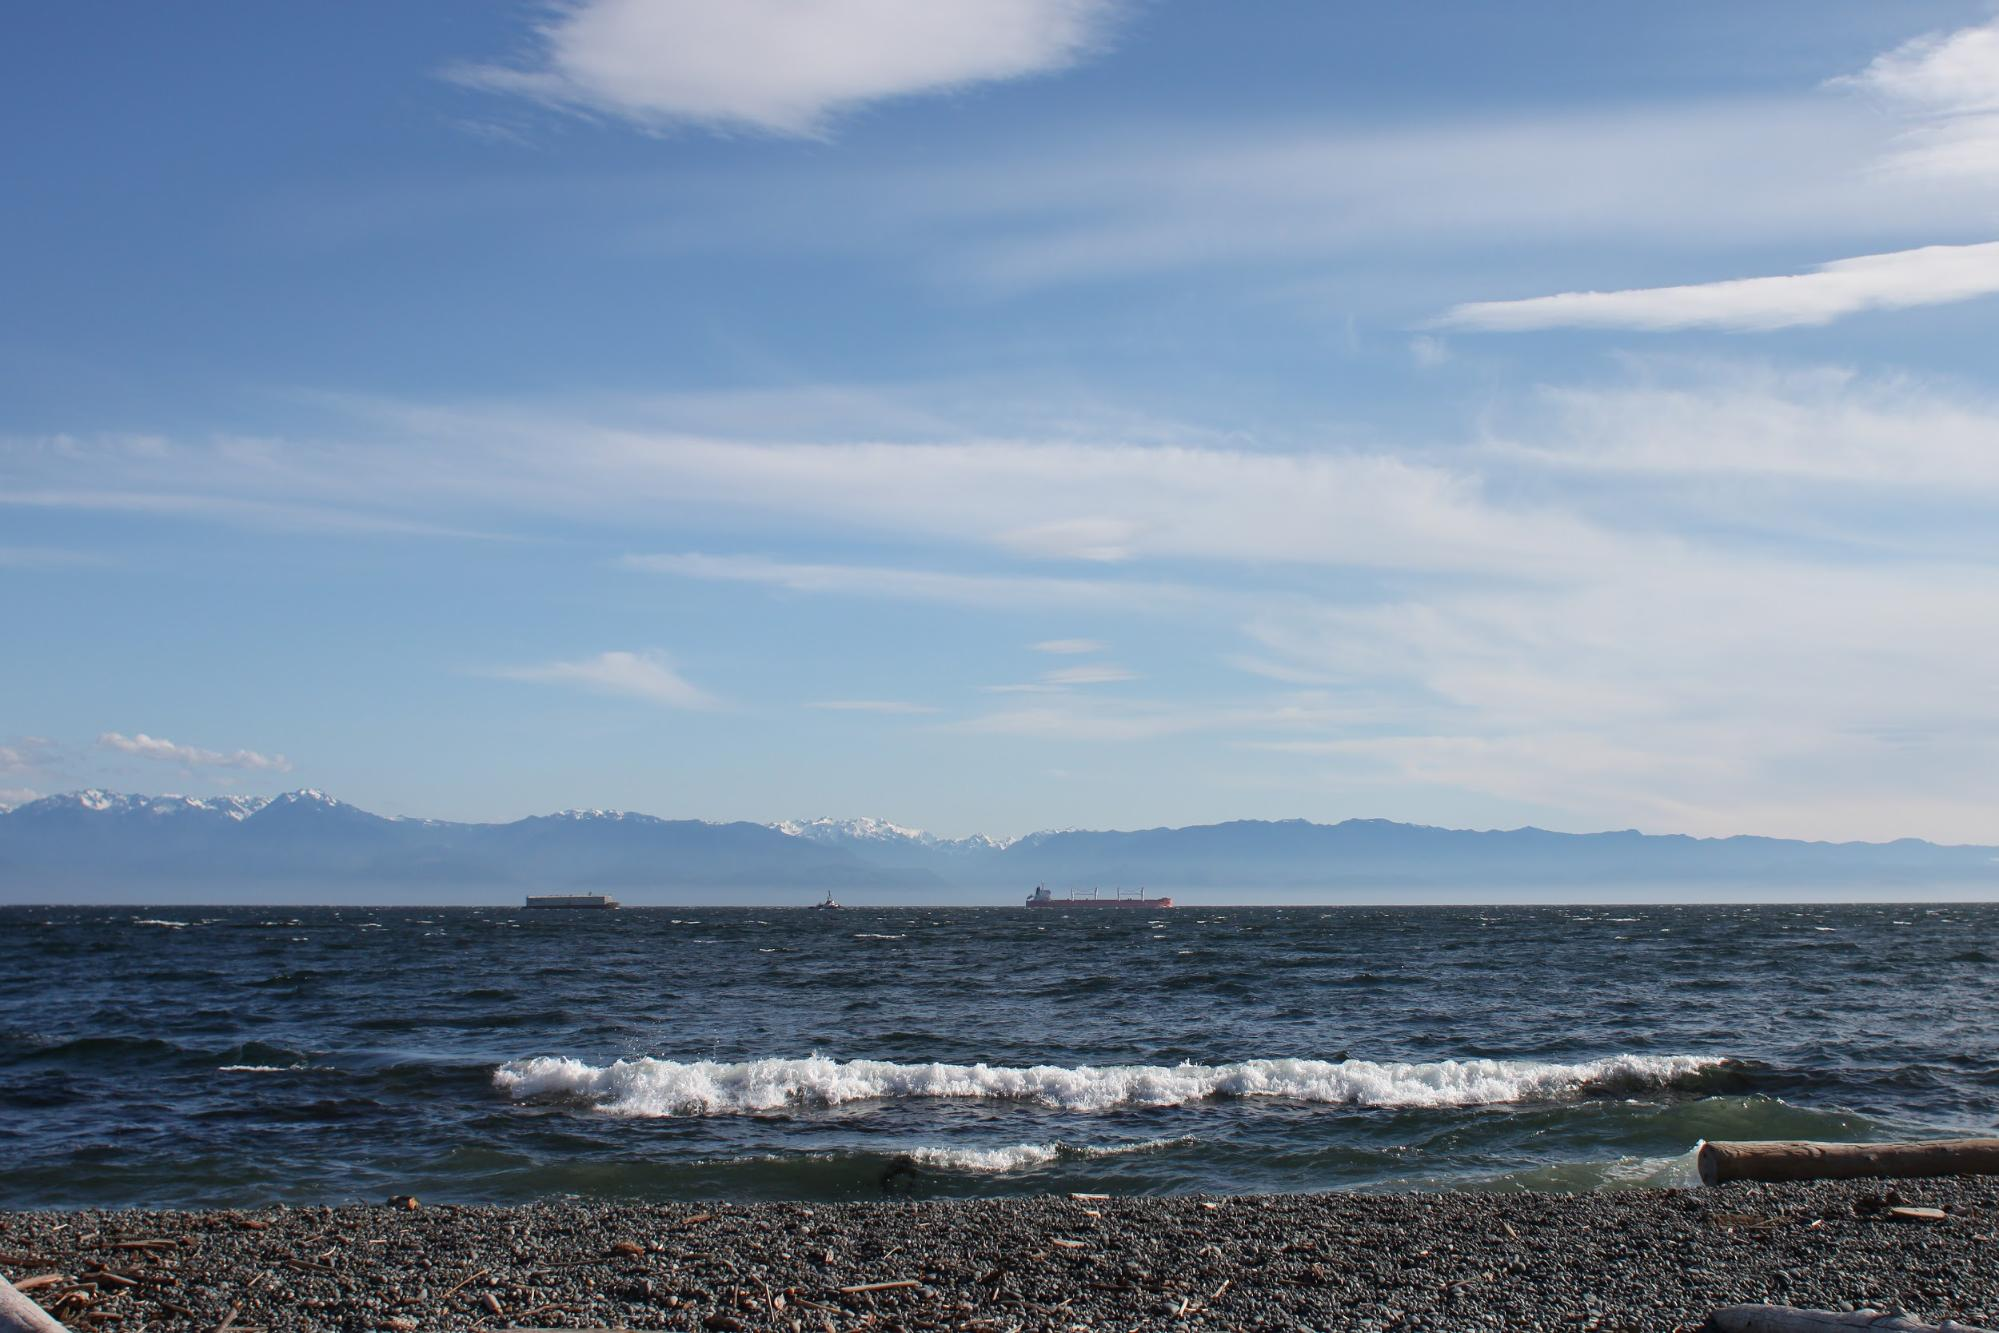 Waves lap a rocky beach under a blue sky.